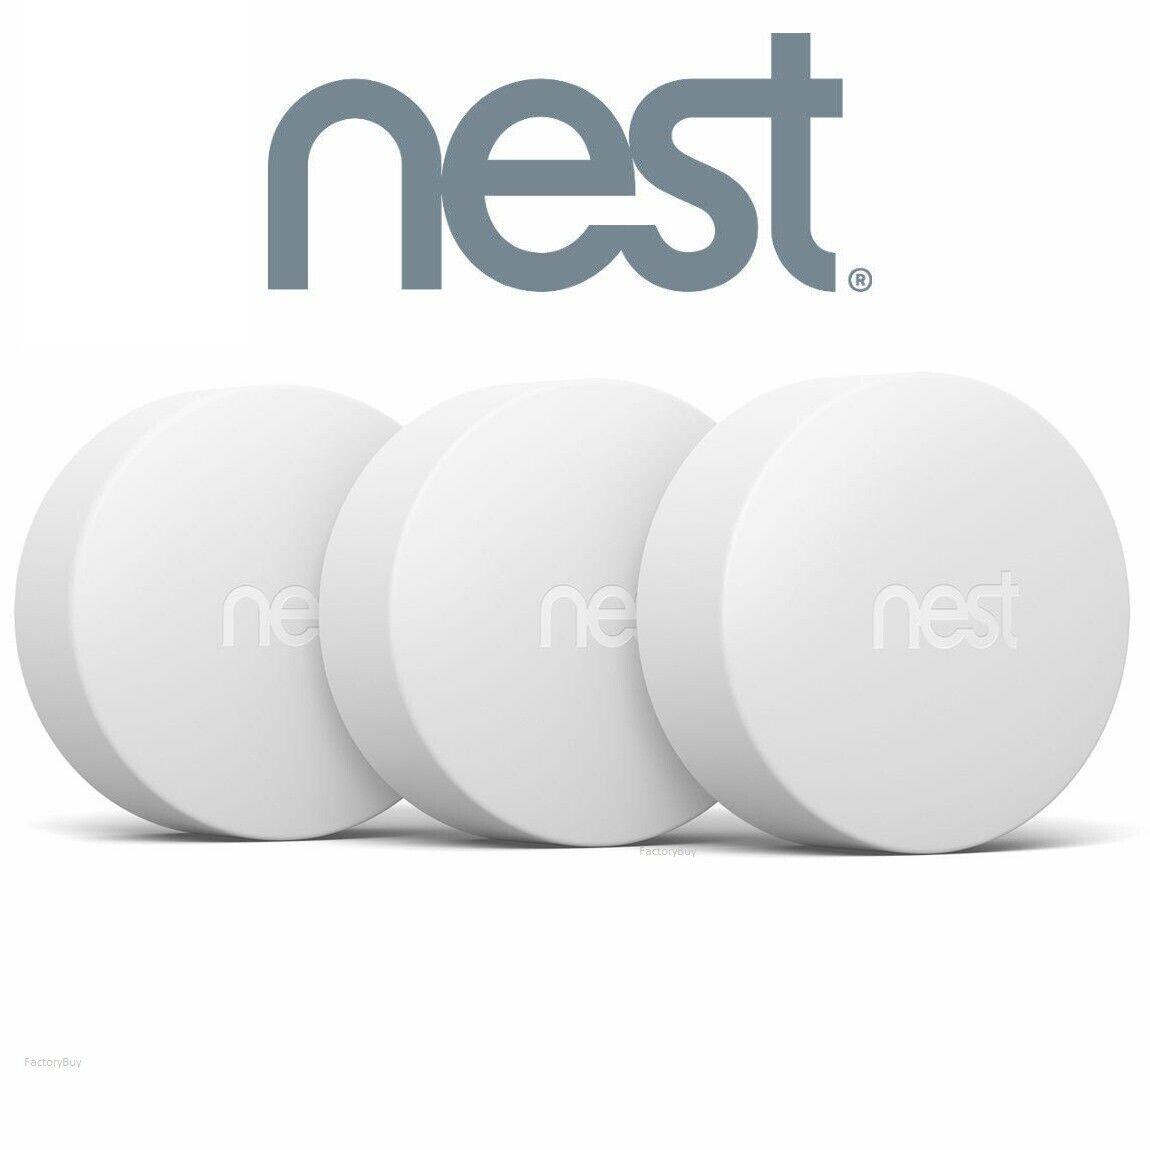 Nest Temperature Sensor 3 Pack Bundle Set for Themostat Whit